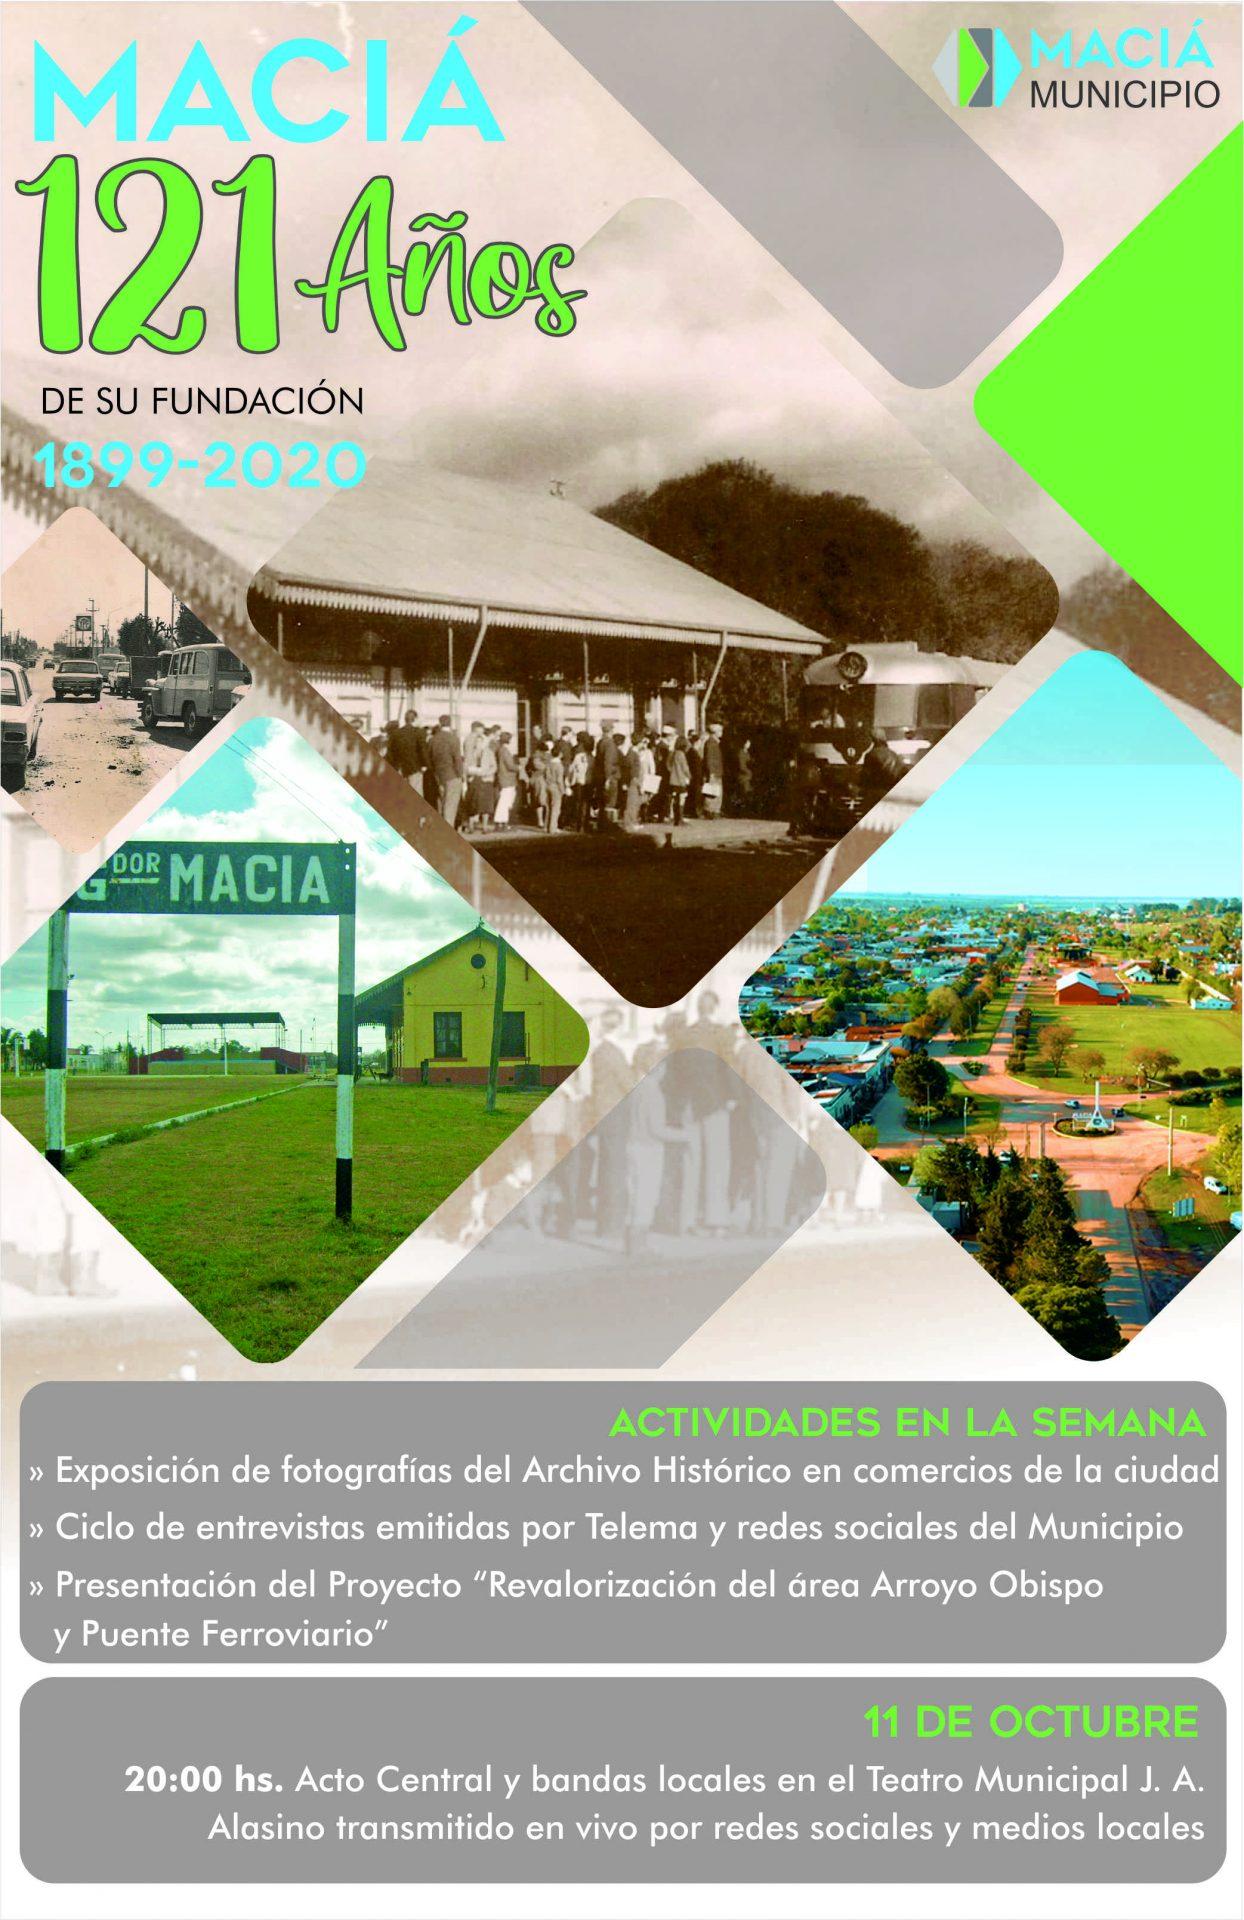 MACIÁ CUMPLE 121 AÑOS